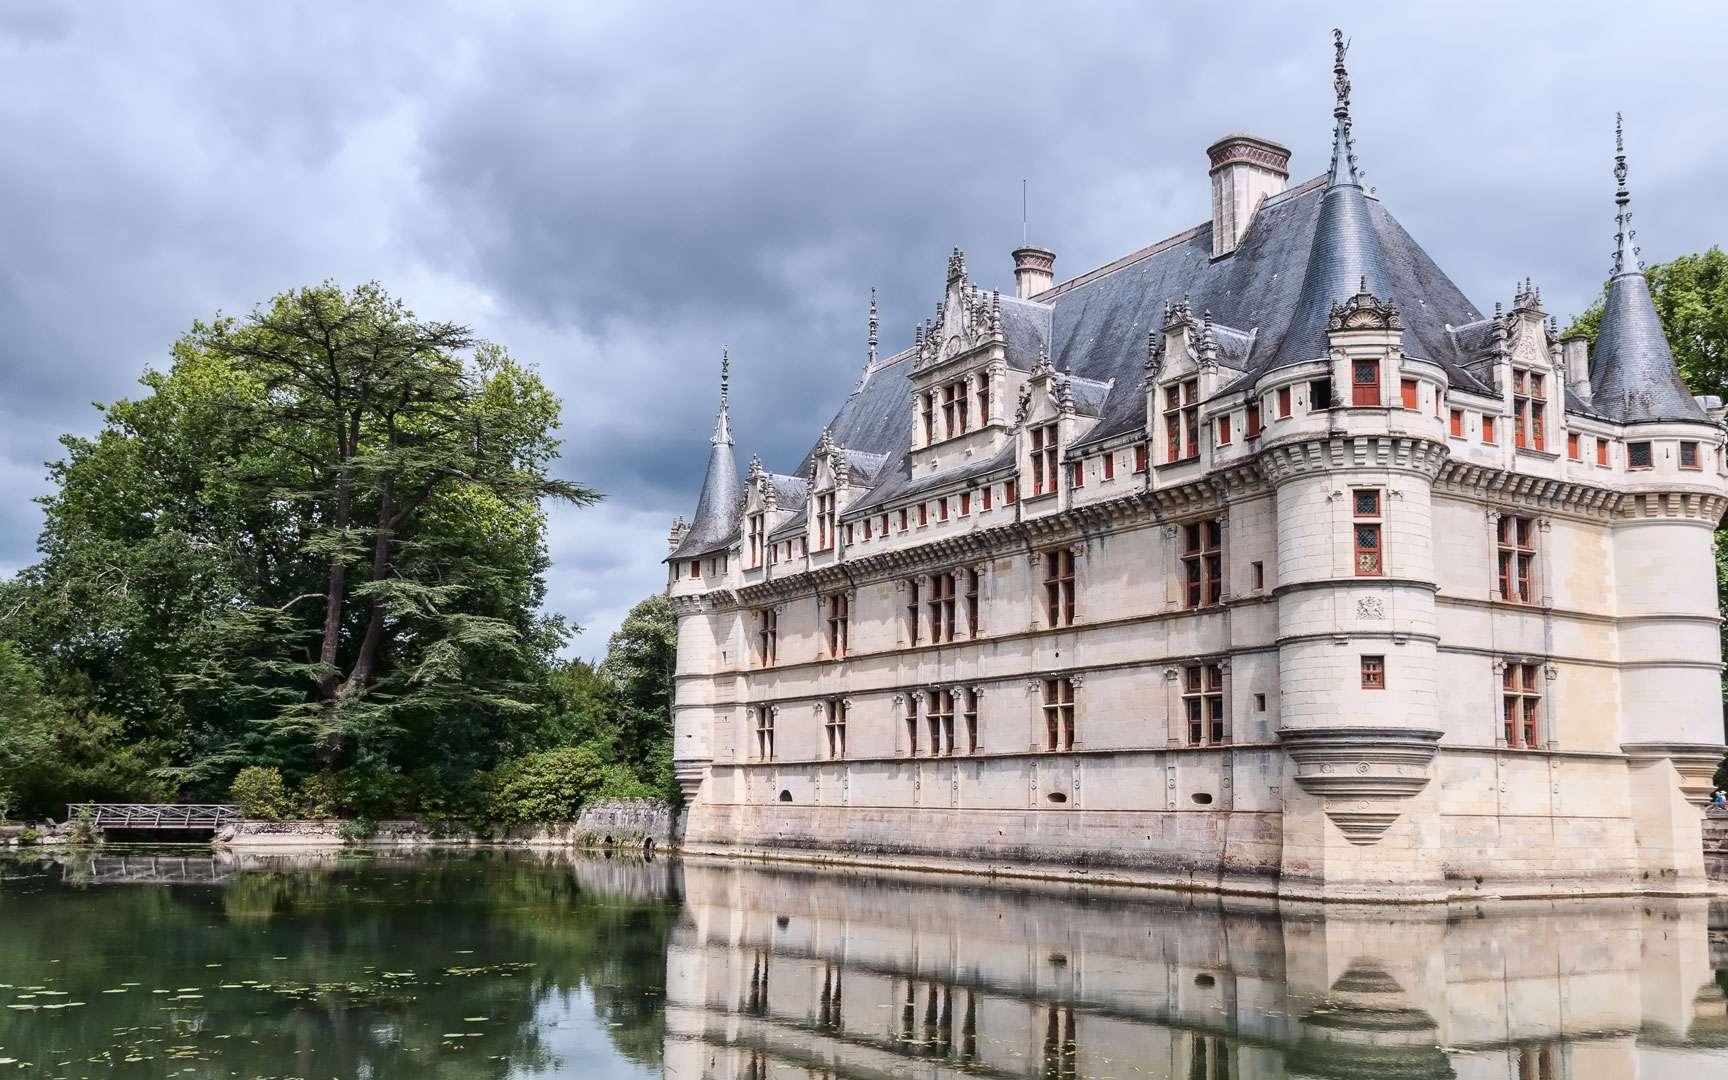 Le château d'Azay-le-Rideau. © Jean-Christophe Benoit CC by-sa 3.0